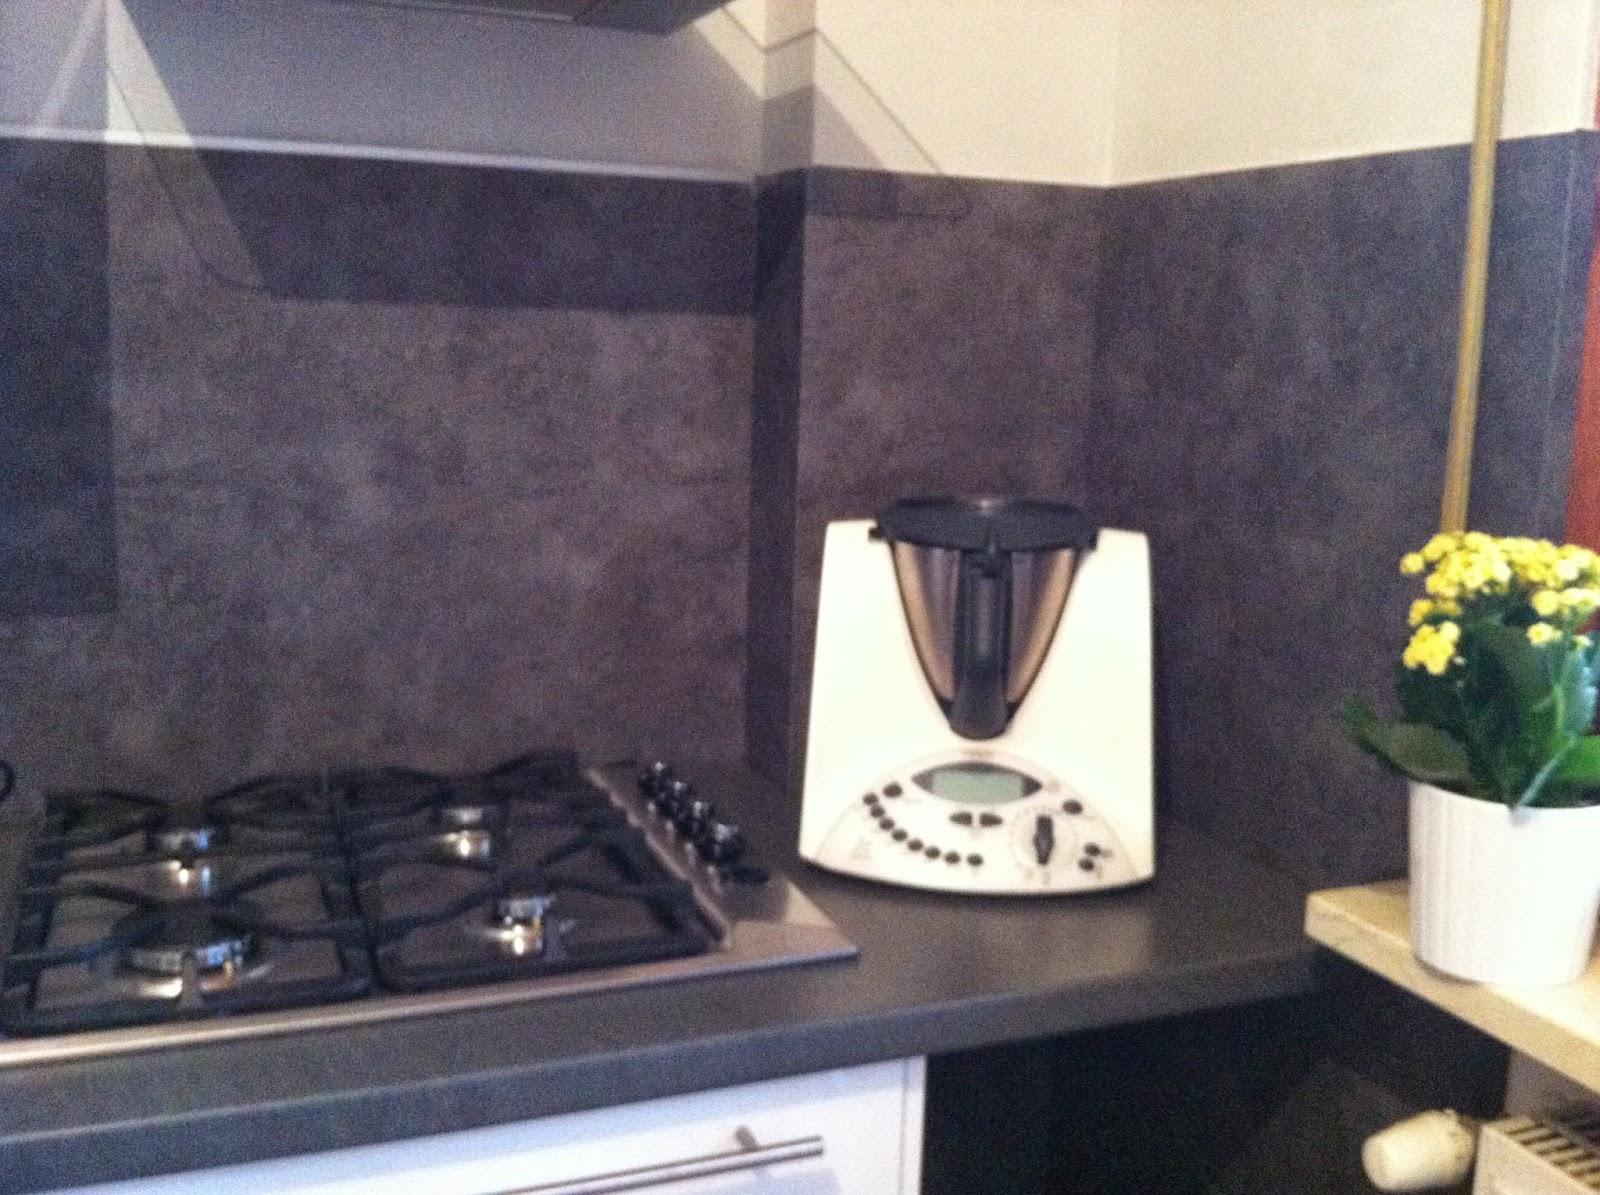 Piastrelle in pvc in cucina - Mattonelle per cucina ...